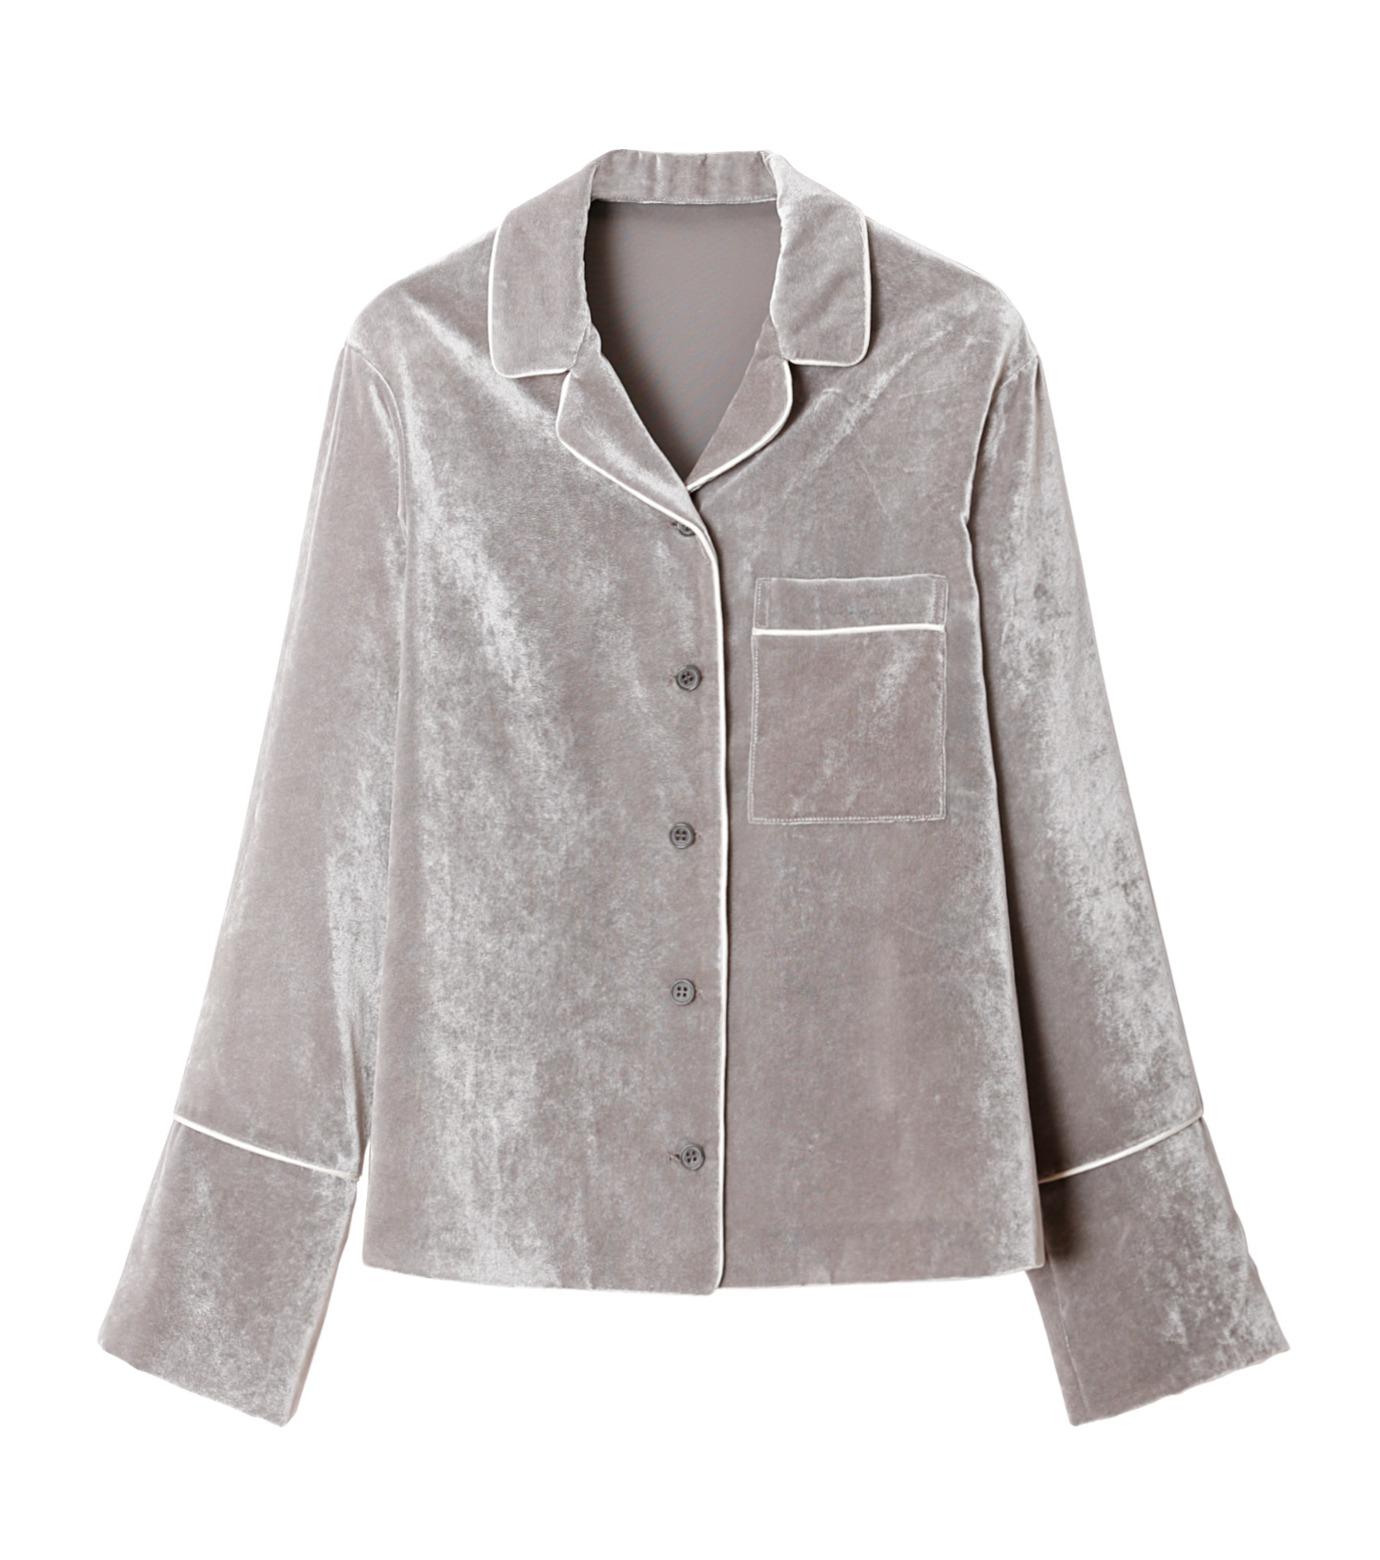 LE CIEL BLEU(ルシェルブルー)のルーズベルベットシャツ-GRAY(シャツ/shirt)-18A63417 拡大詳細画像4